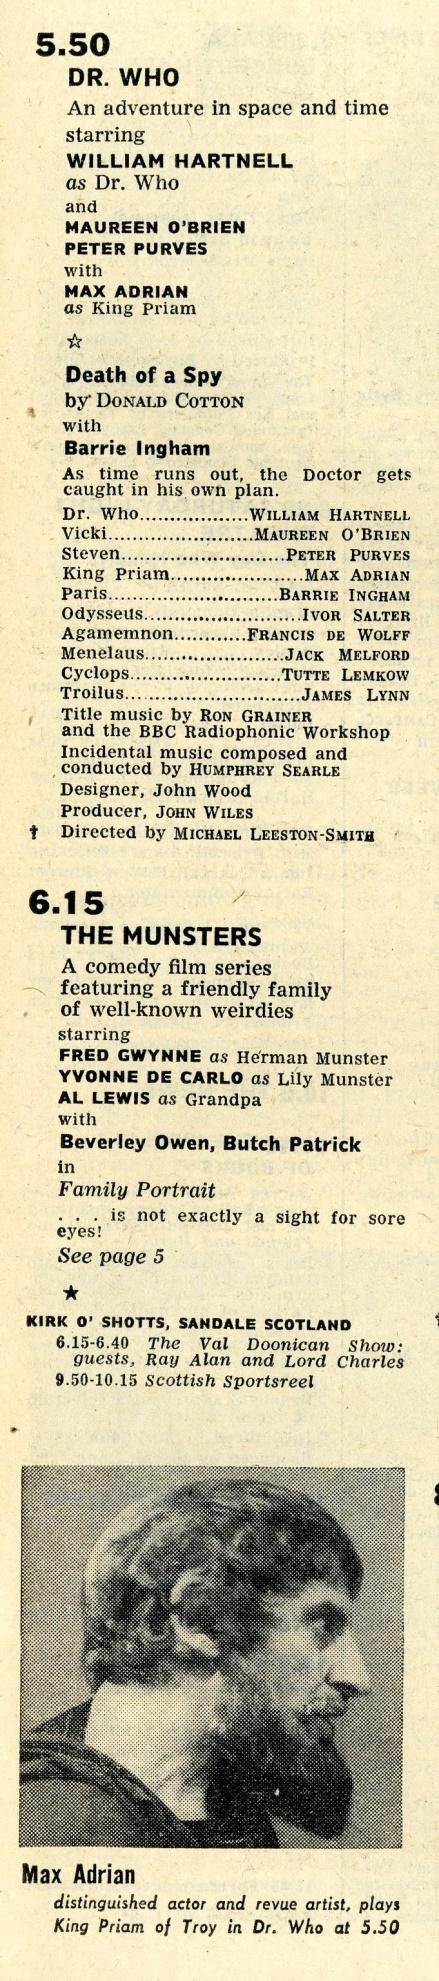 Radio Times, October 30 - November 5, 1965